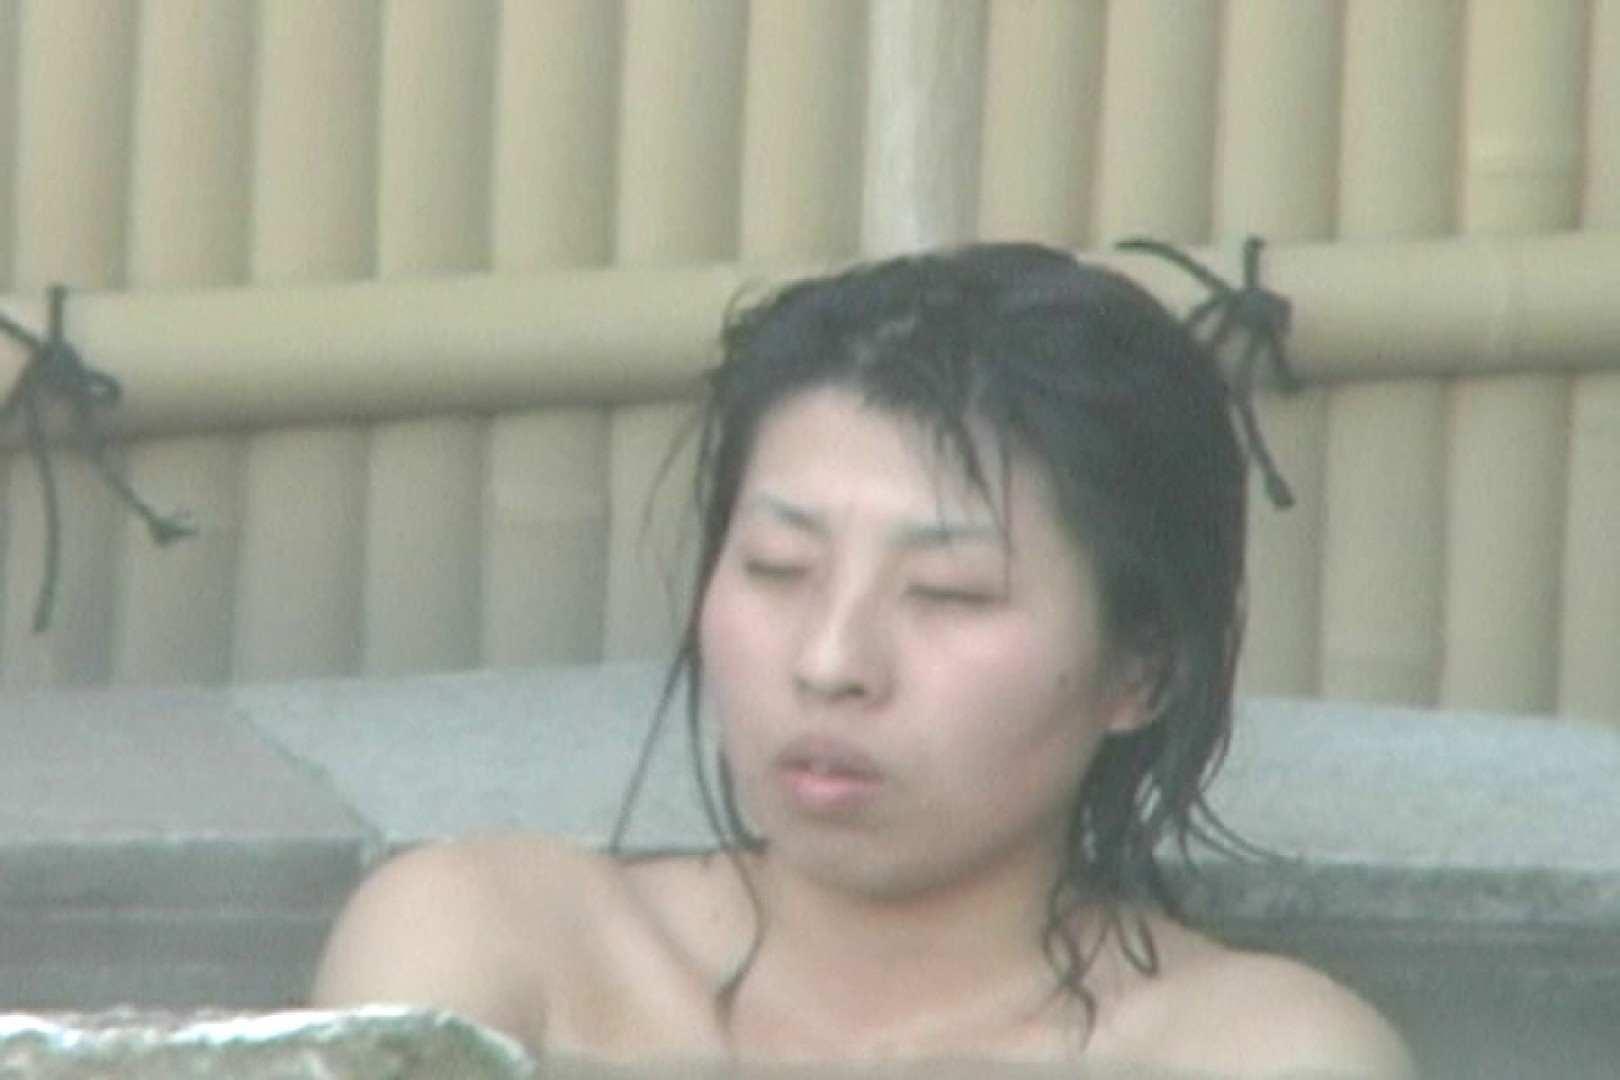 Aquaな露天風呂Vol.589 0  74連発 26